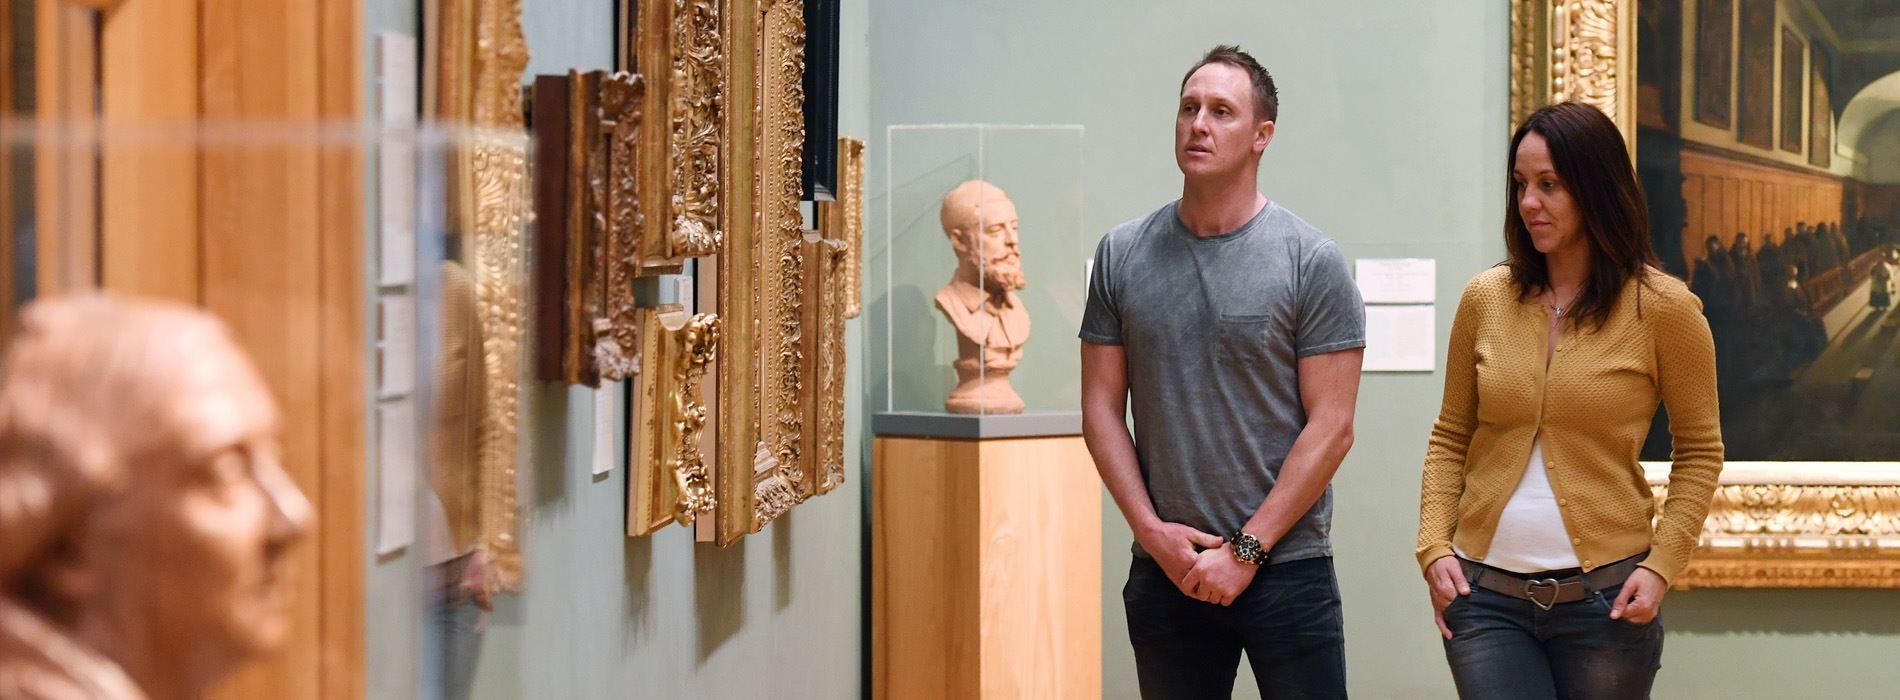 Art at National Museum